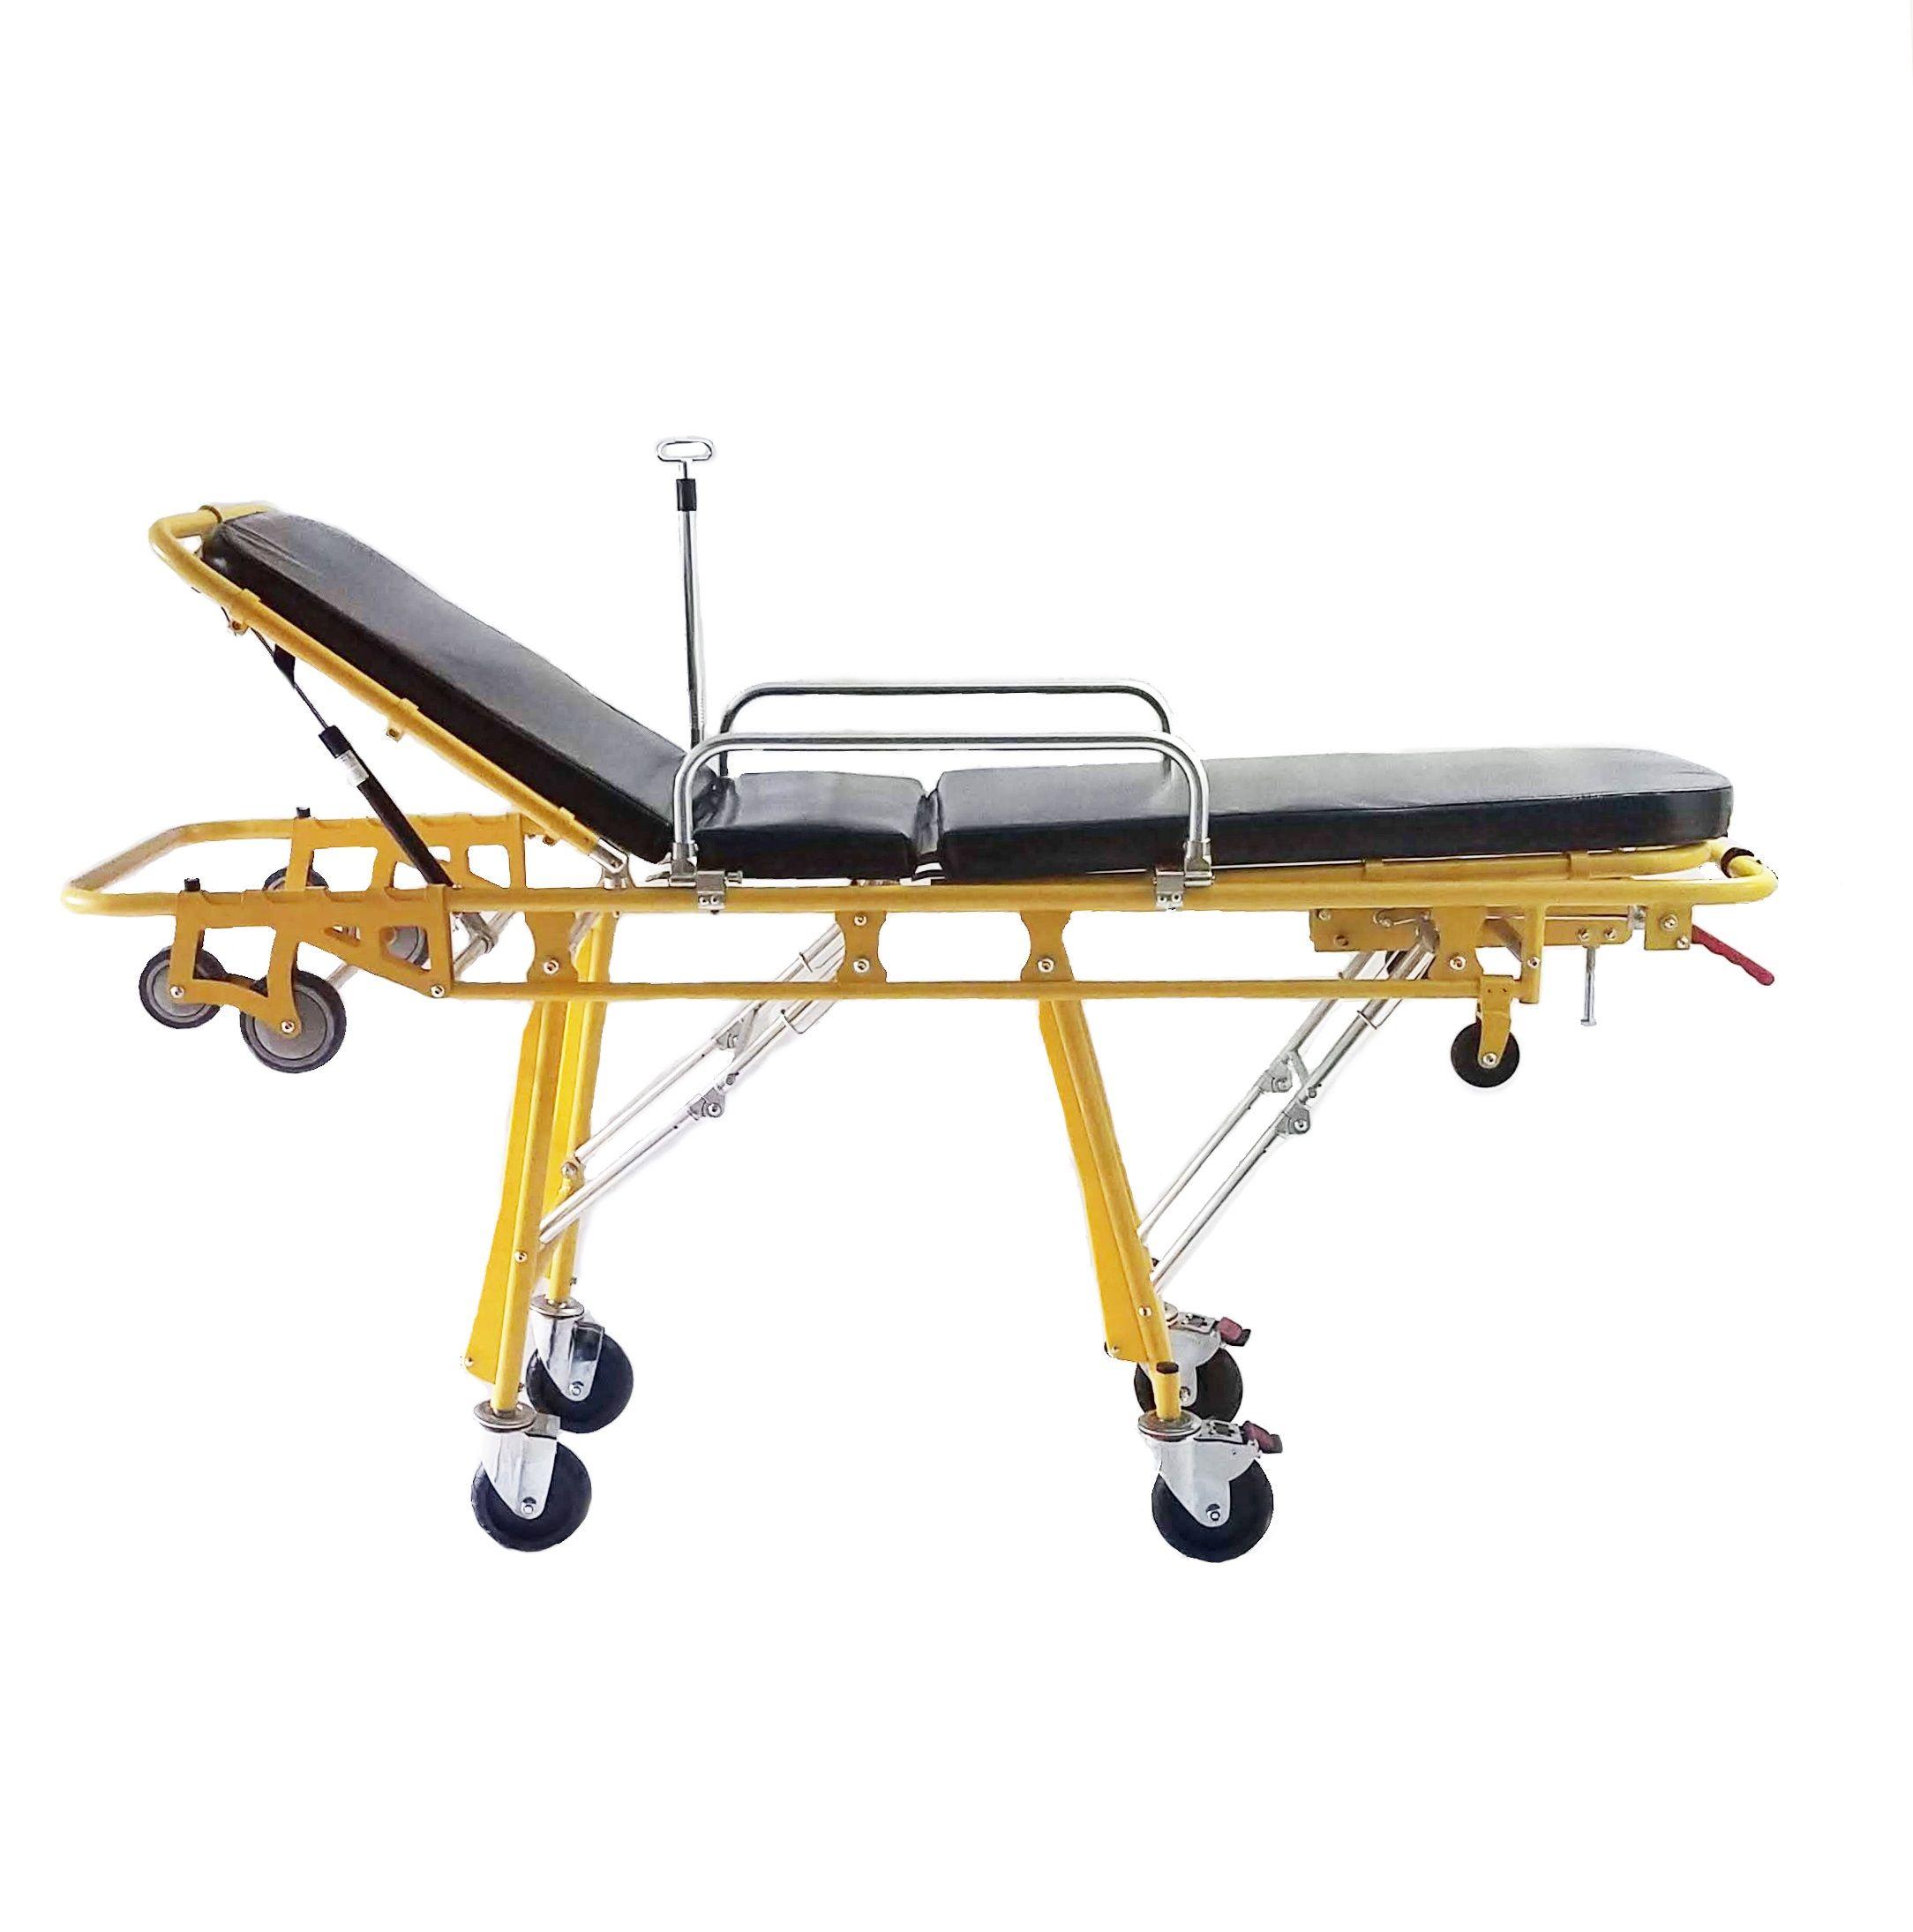 Heavy Duty Aluminum Alloy Ambulance Stretcher